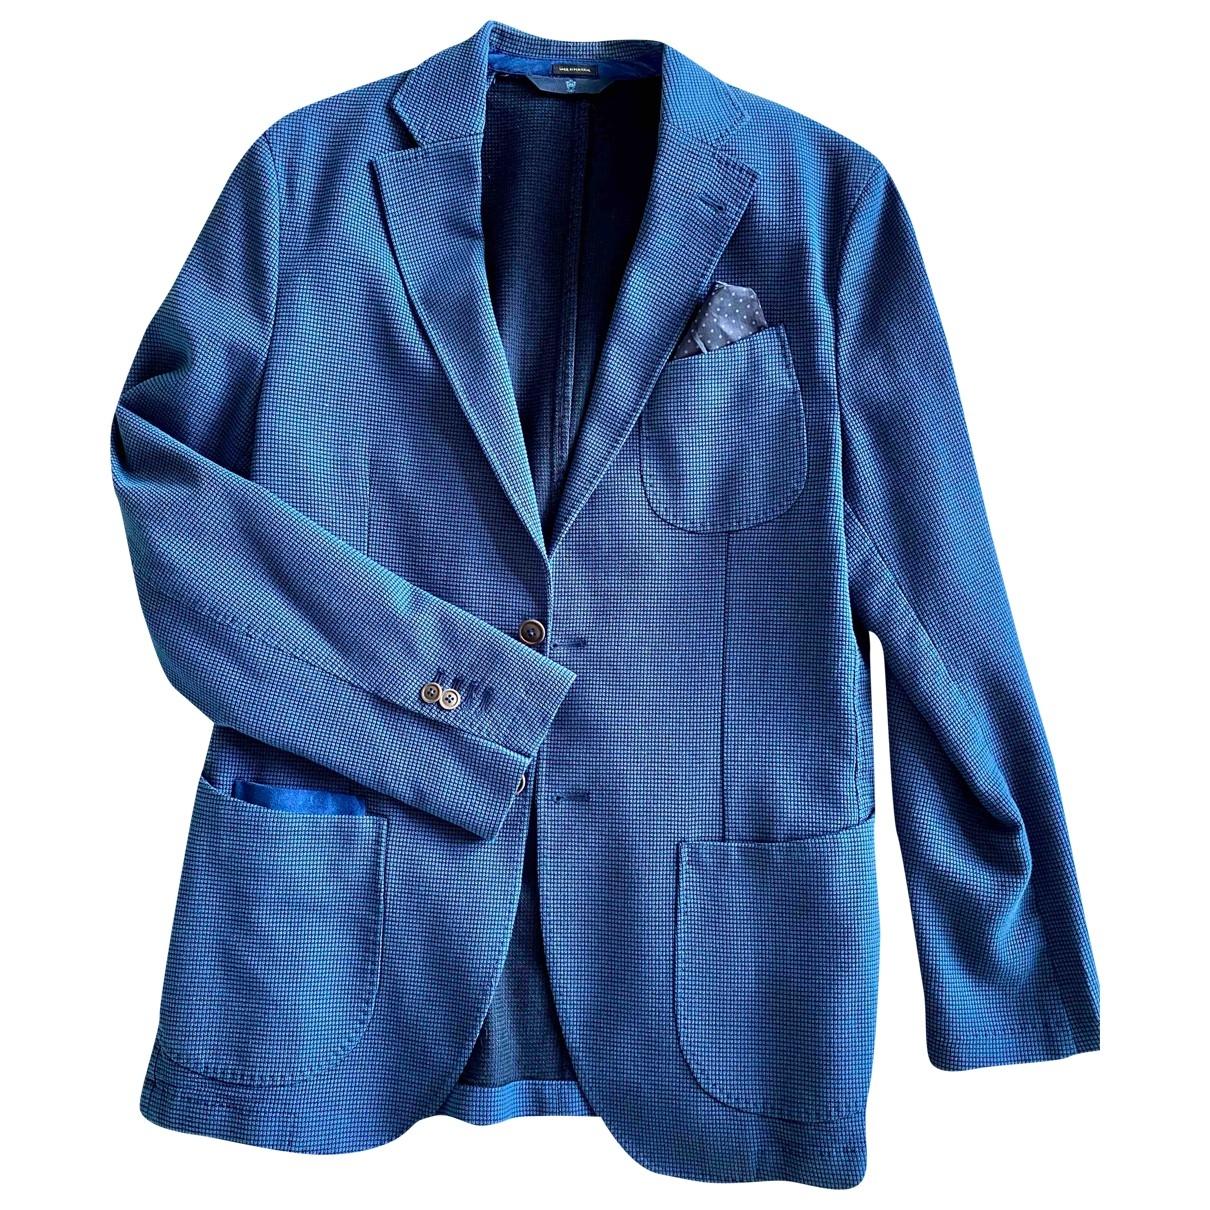 Massimo Dutti \N Blue Cotton Suits for Men M International